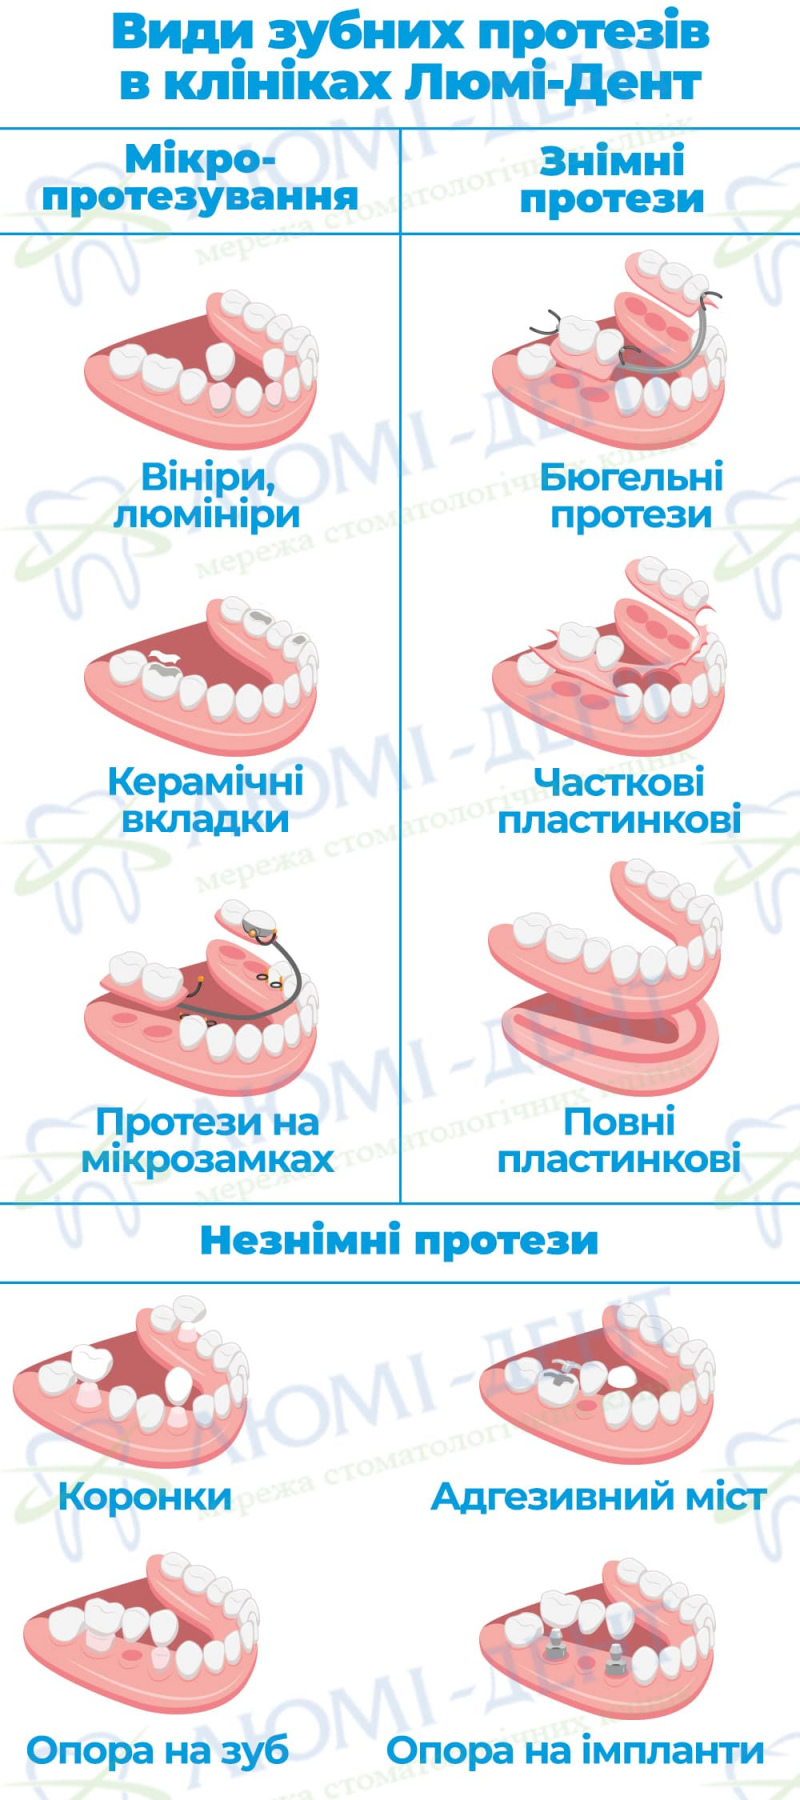 Консоль на зуби фото ЛюміДент